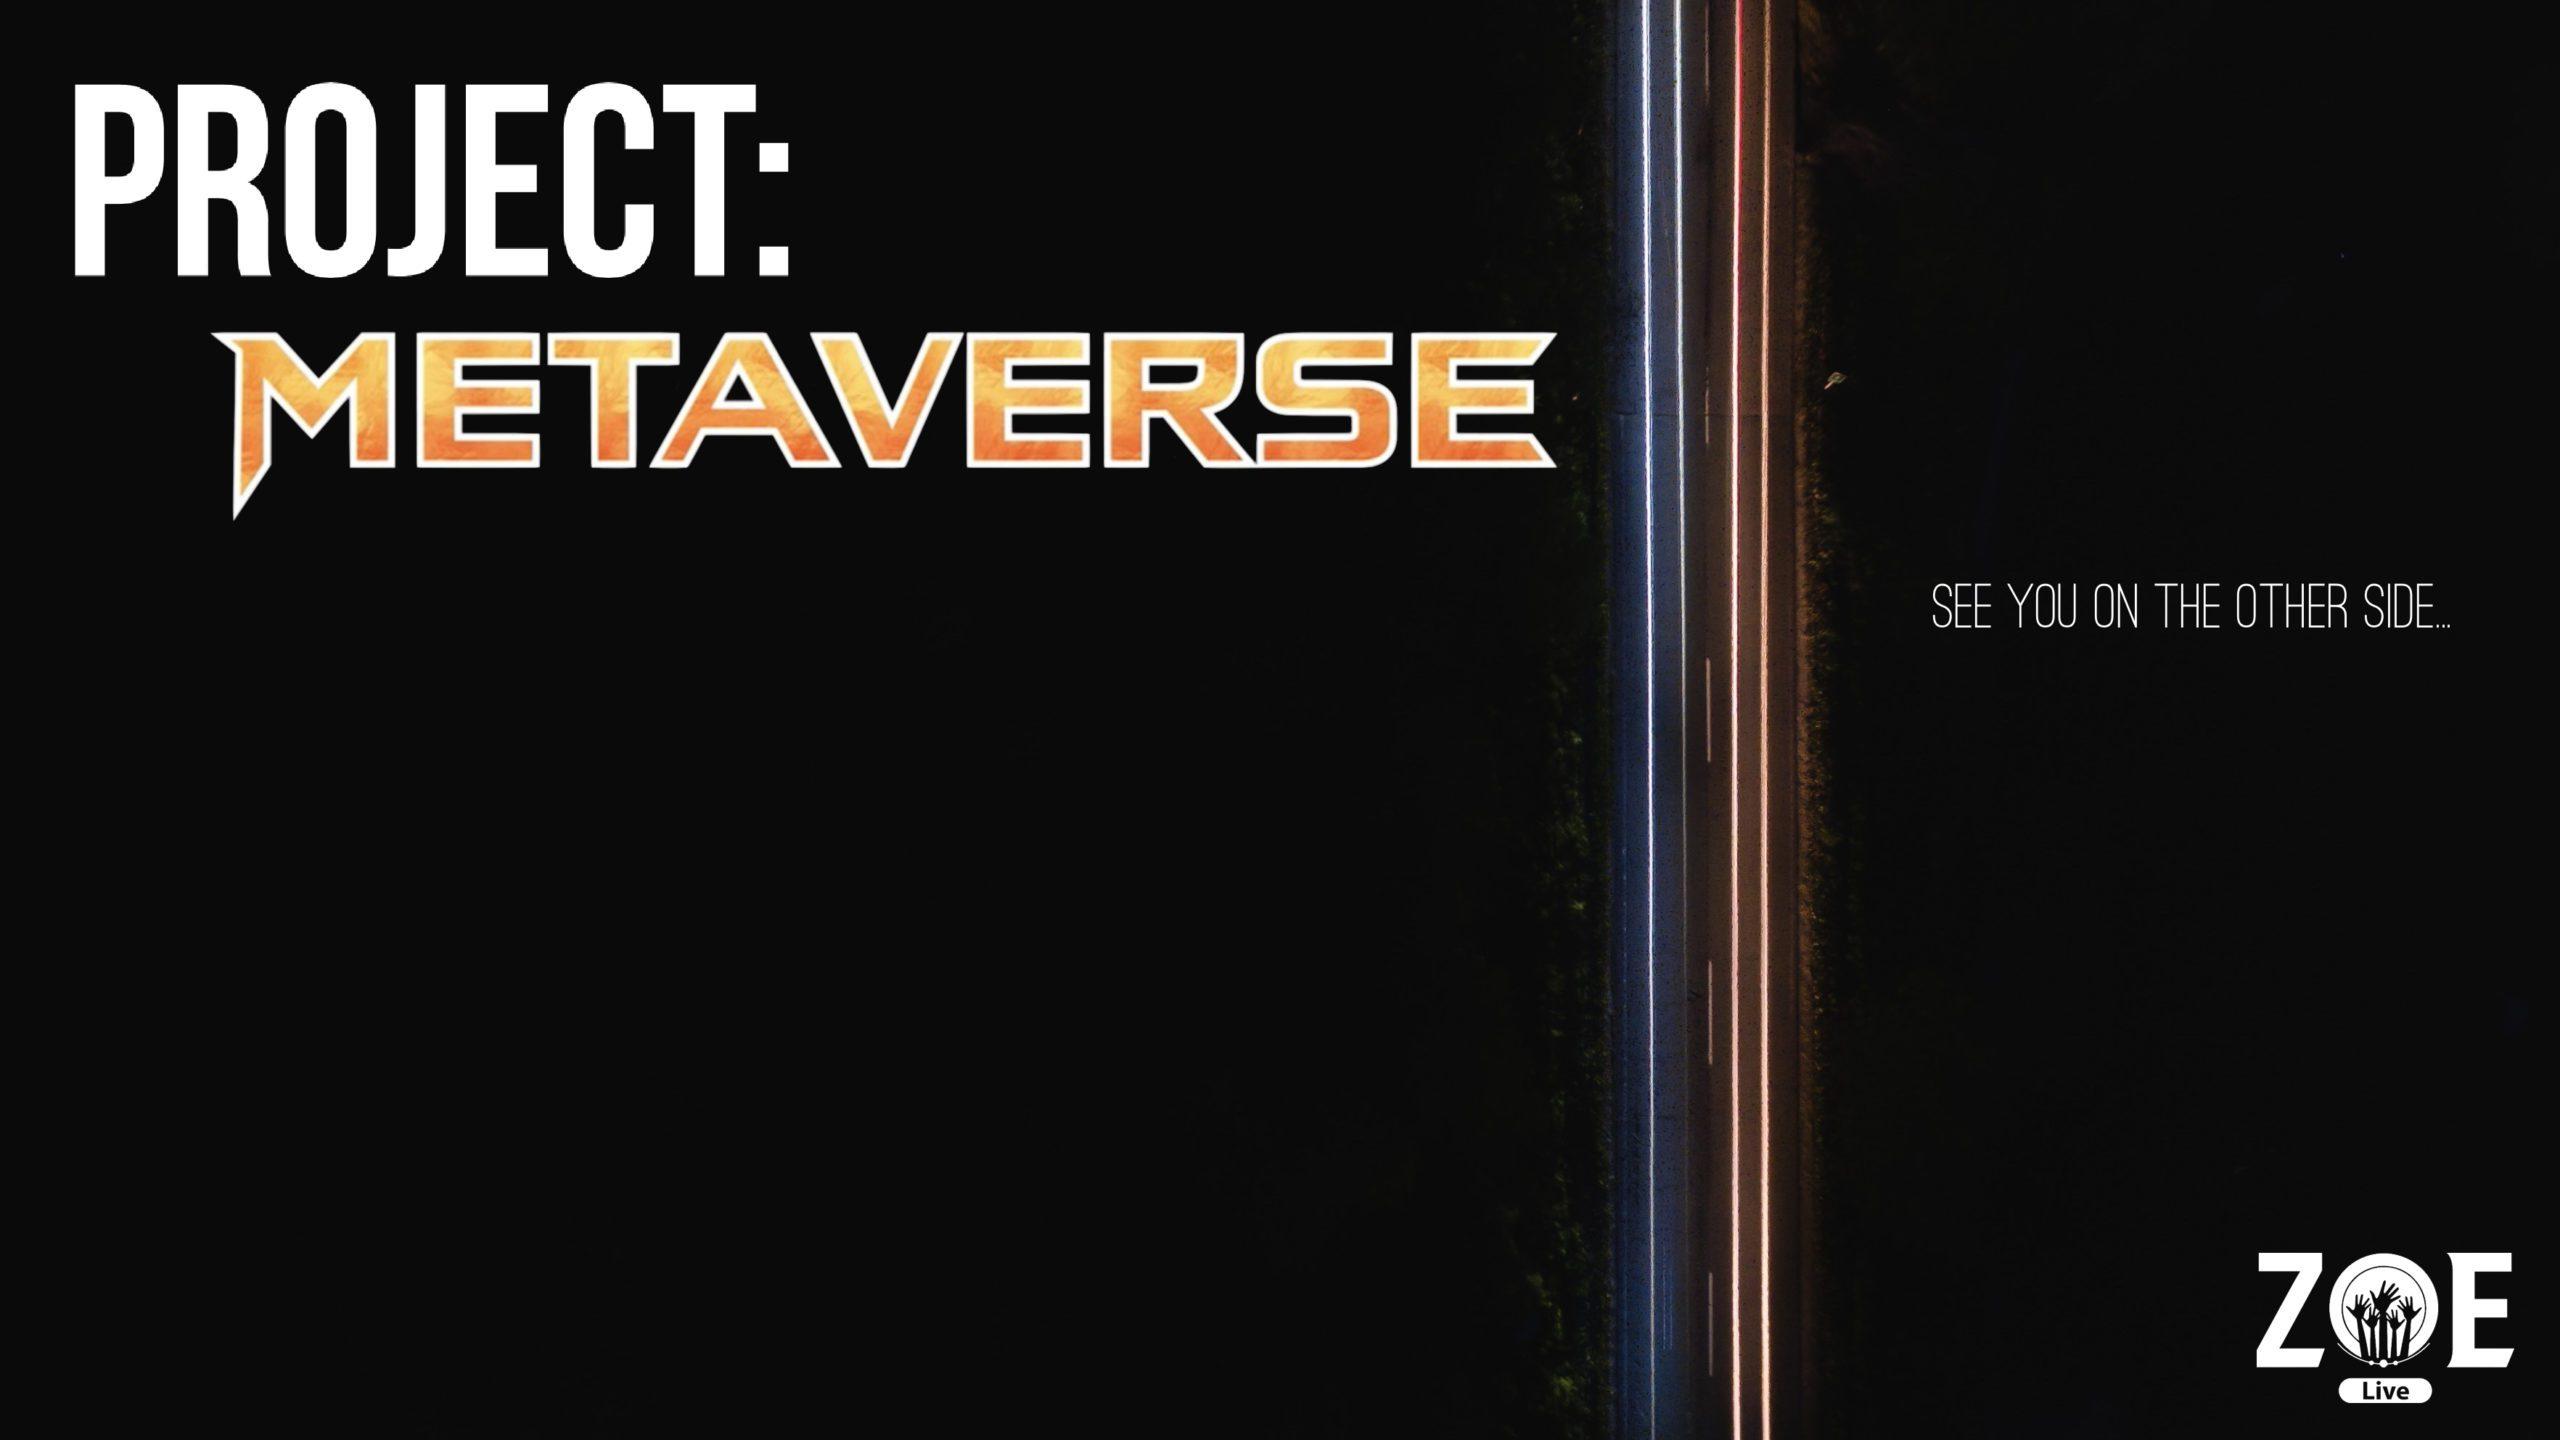 project: metaverse